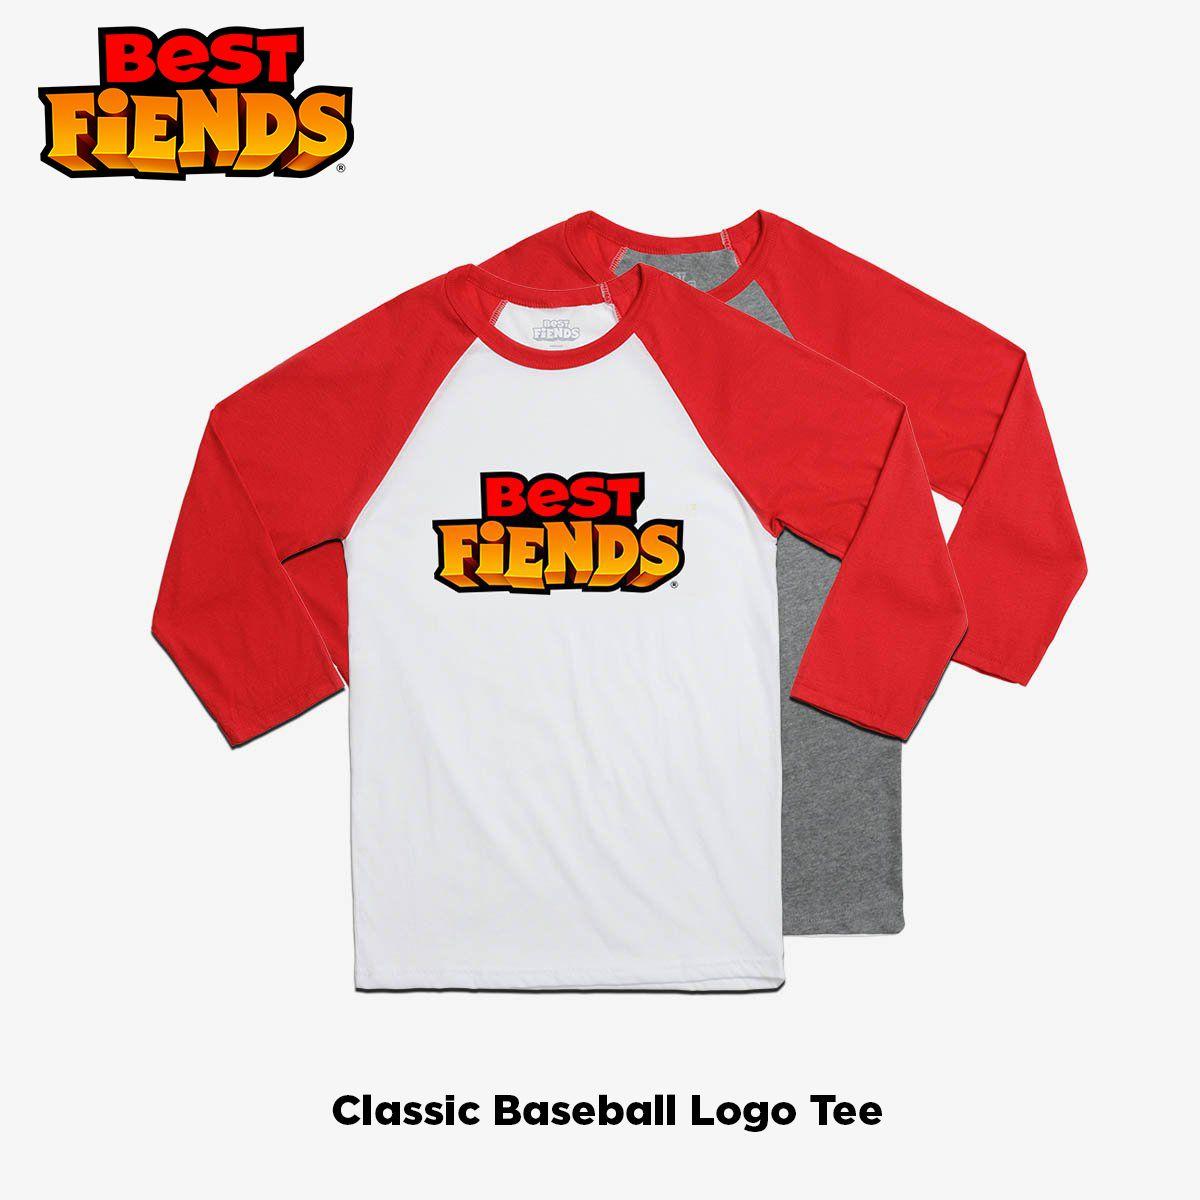 Classic Baseball Logo Tee in 2019 Best fiends, Baseball